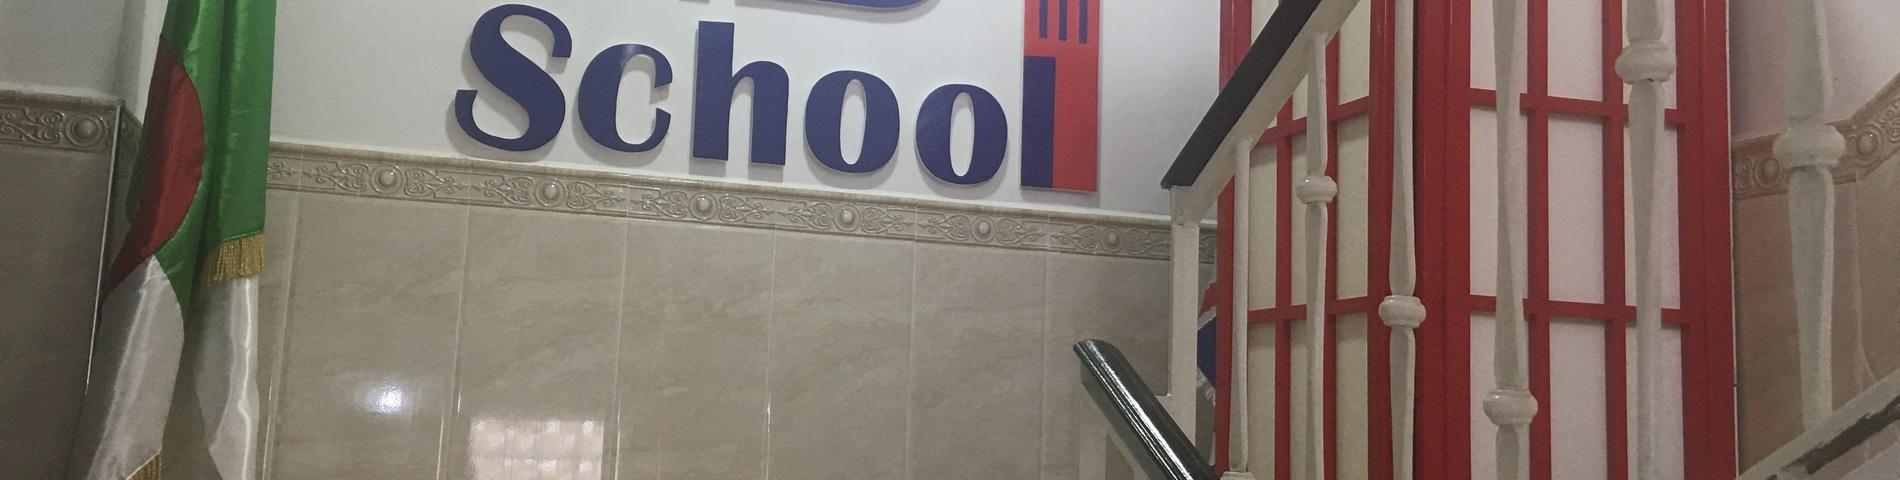 ABI School foto 1